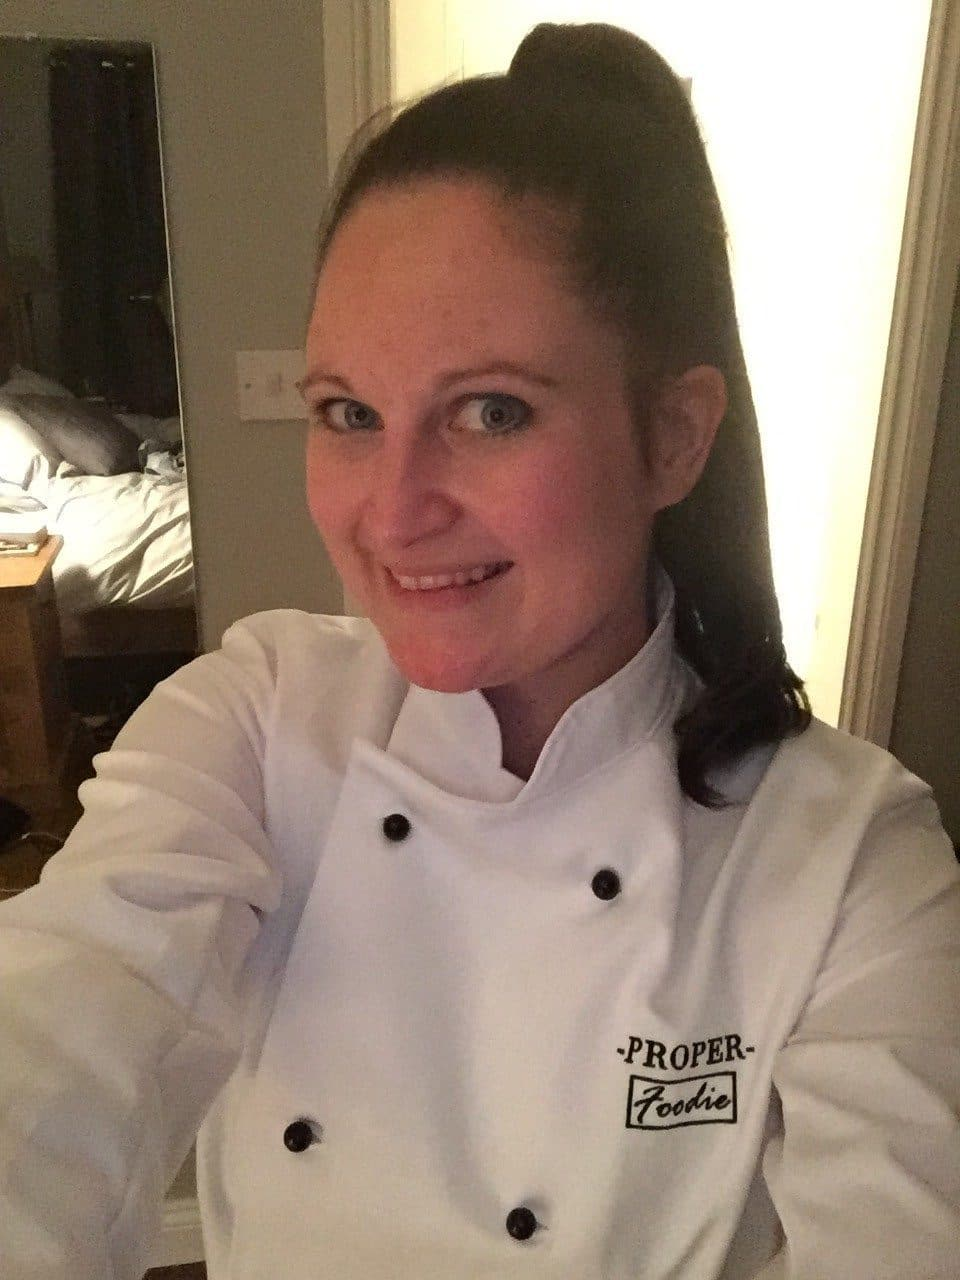 My new ProperFoodie chef whites